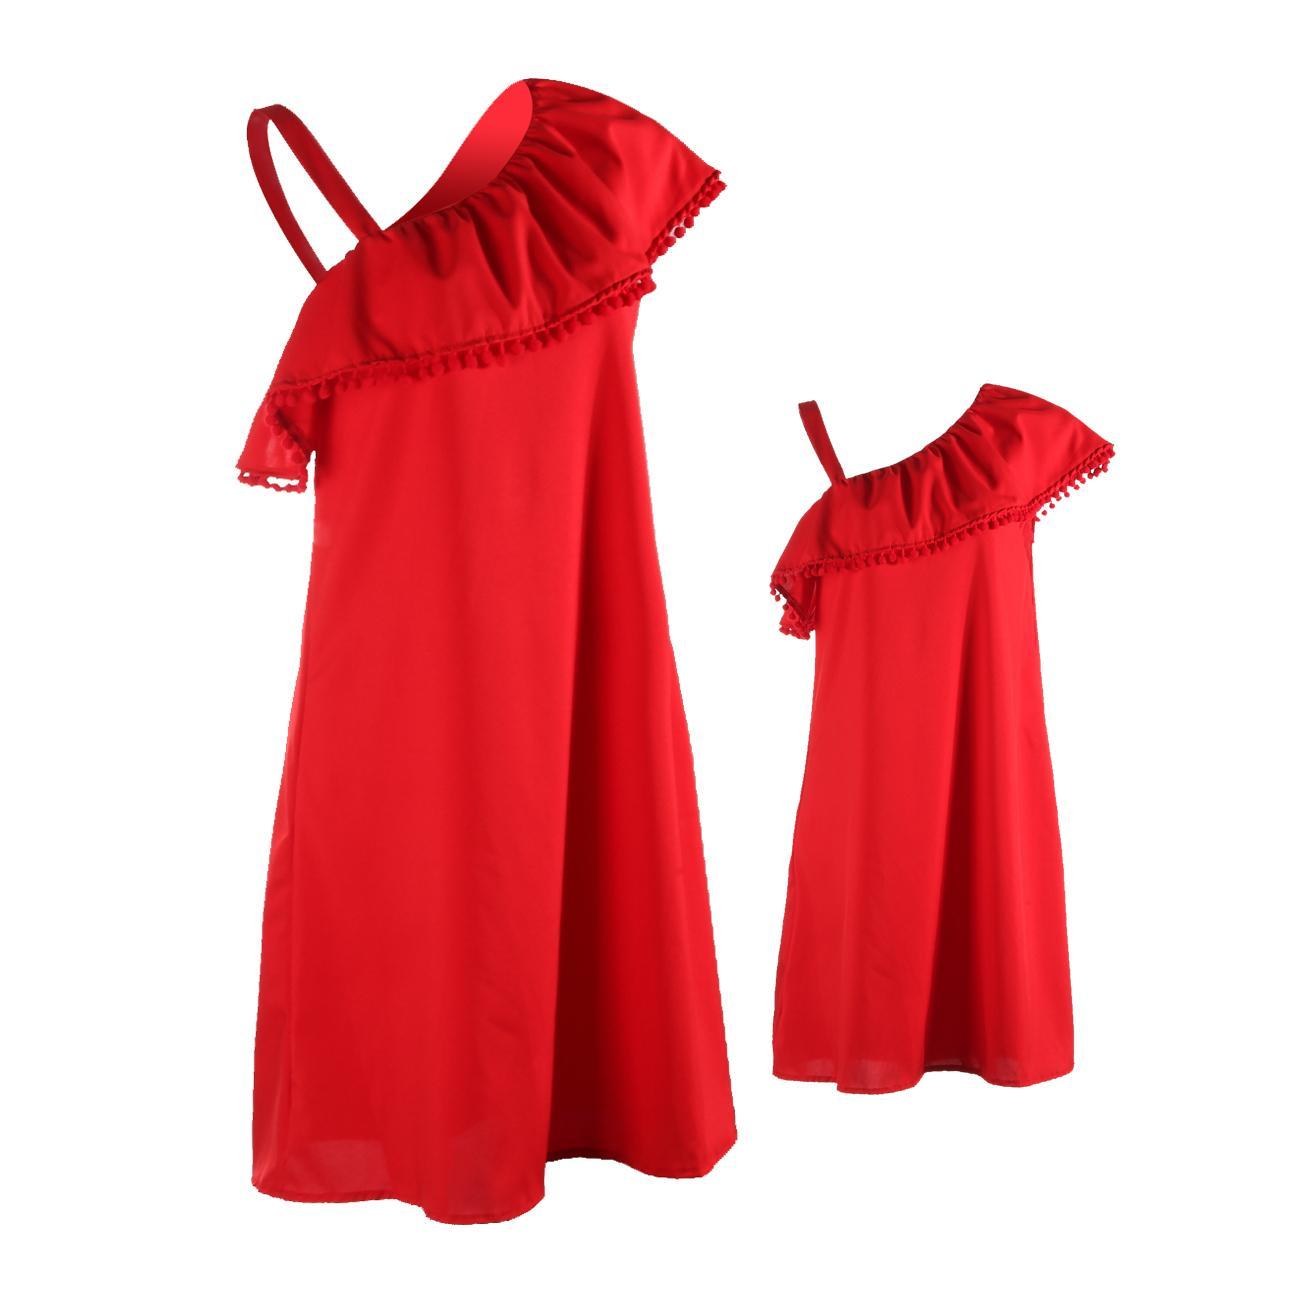 Matching Mother Daughter Clothes Mom And Girls Solid Ruffles Short Sleeve Off Shoulder Dress Sundress Summer